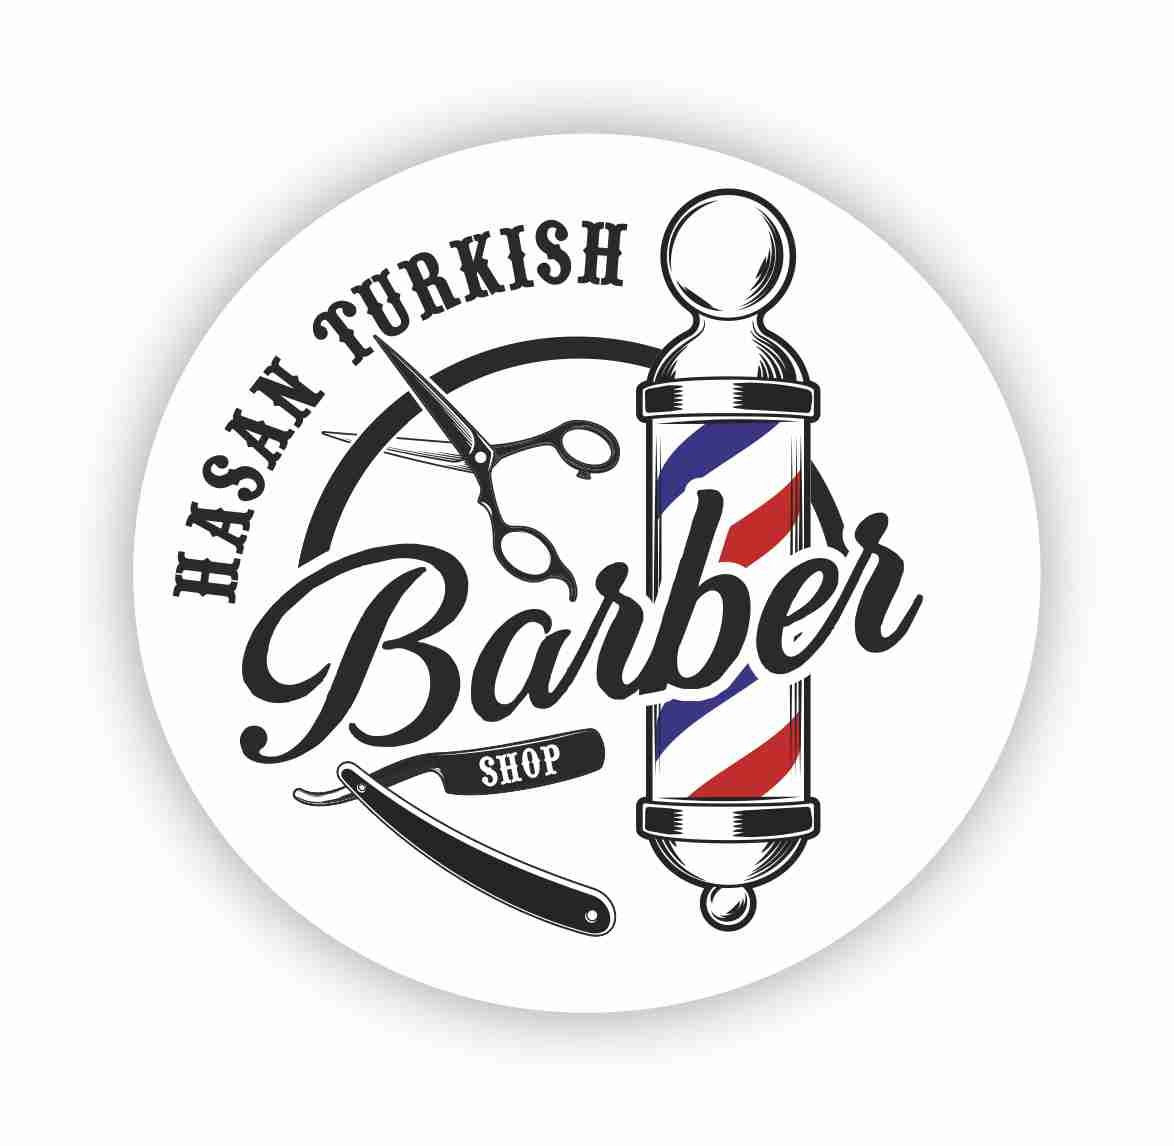 HASAN BARBERS